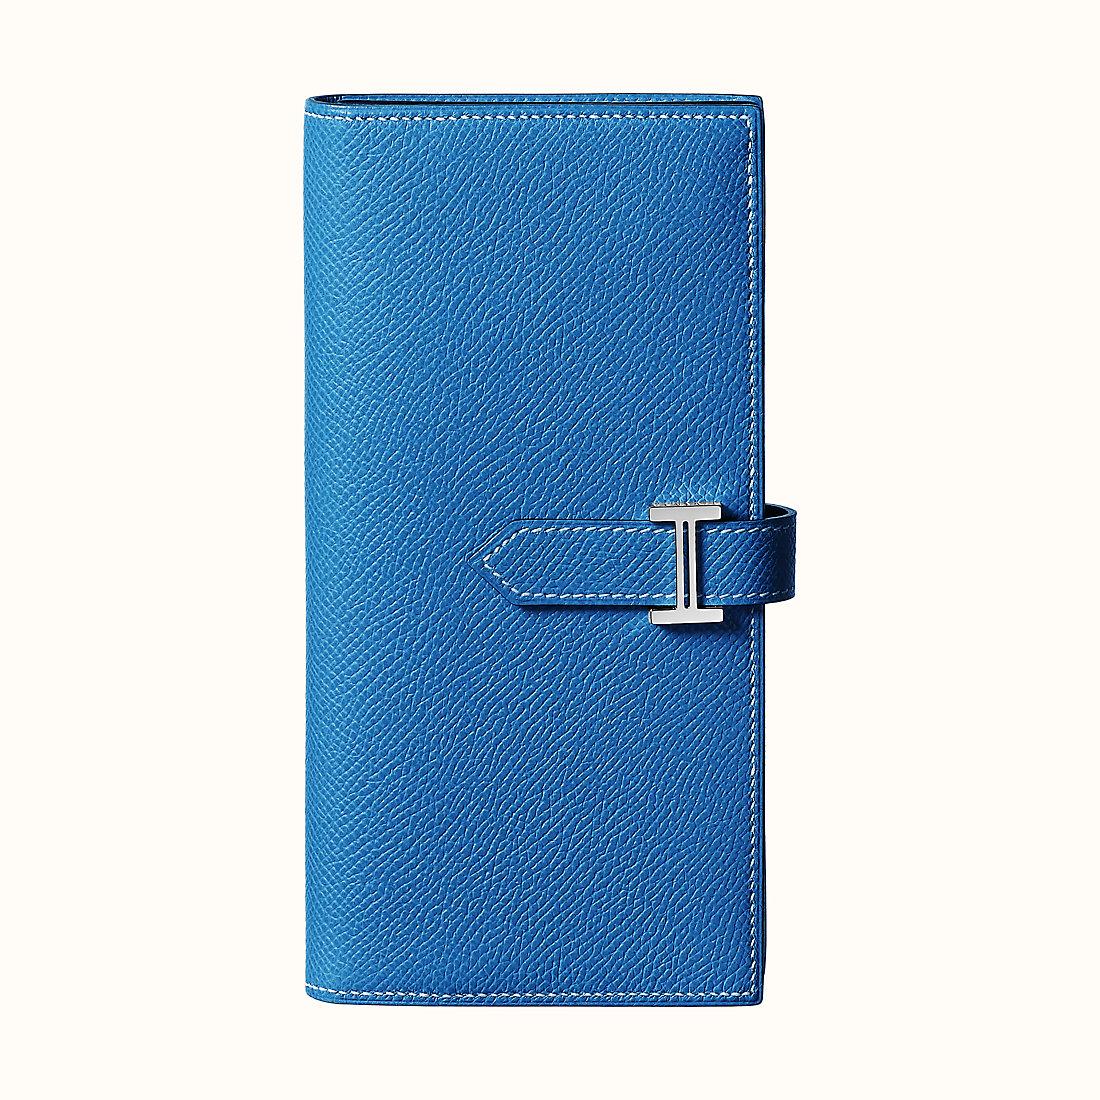 臺灣基隆市 Hermes Bearn wallet Epsom CKI7 Bleu Zellige 琉璃藍